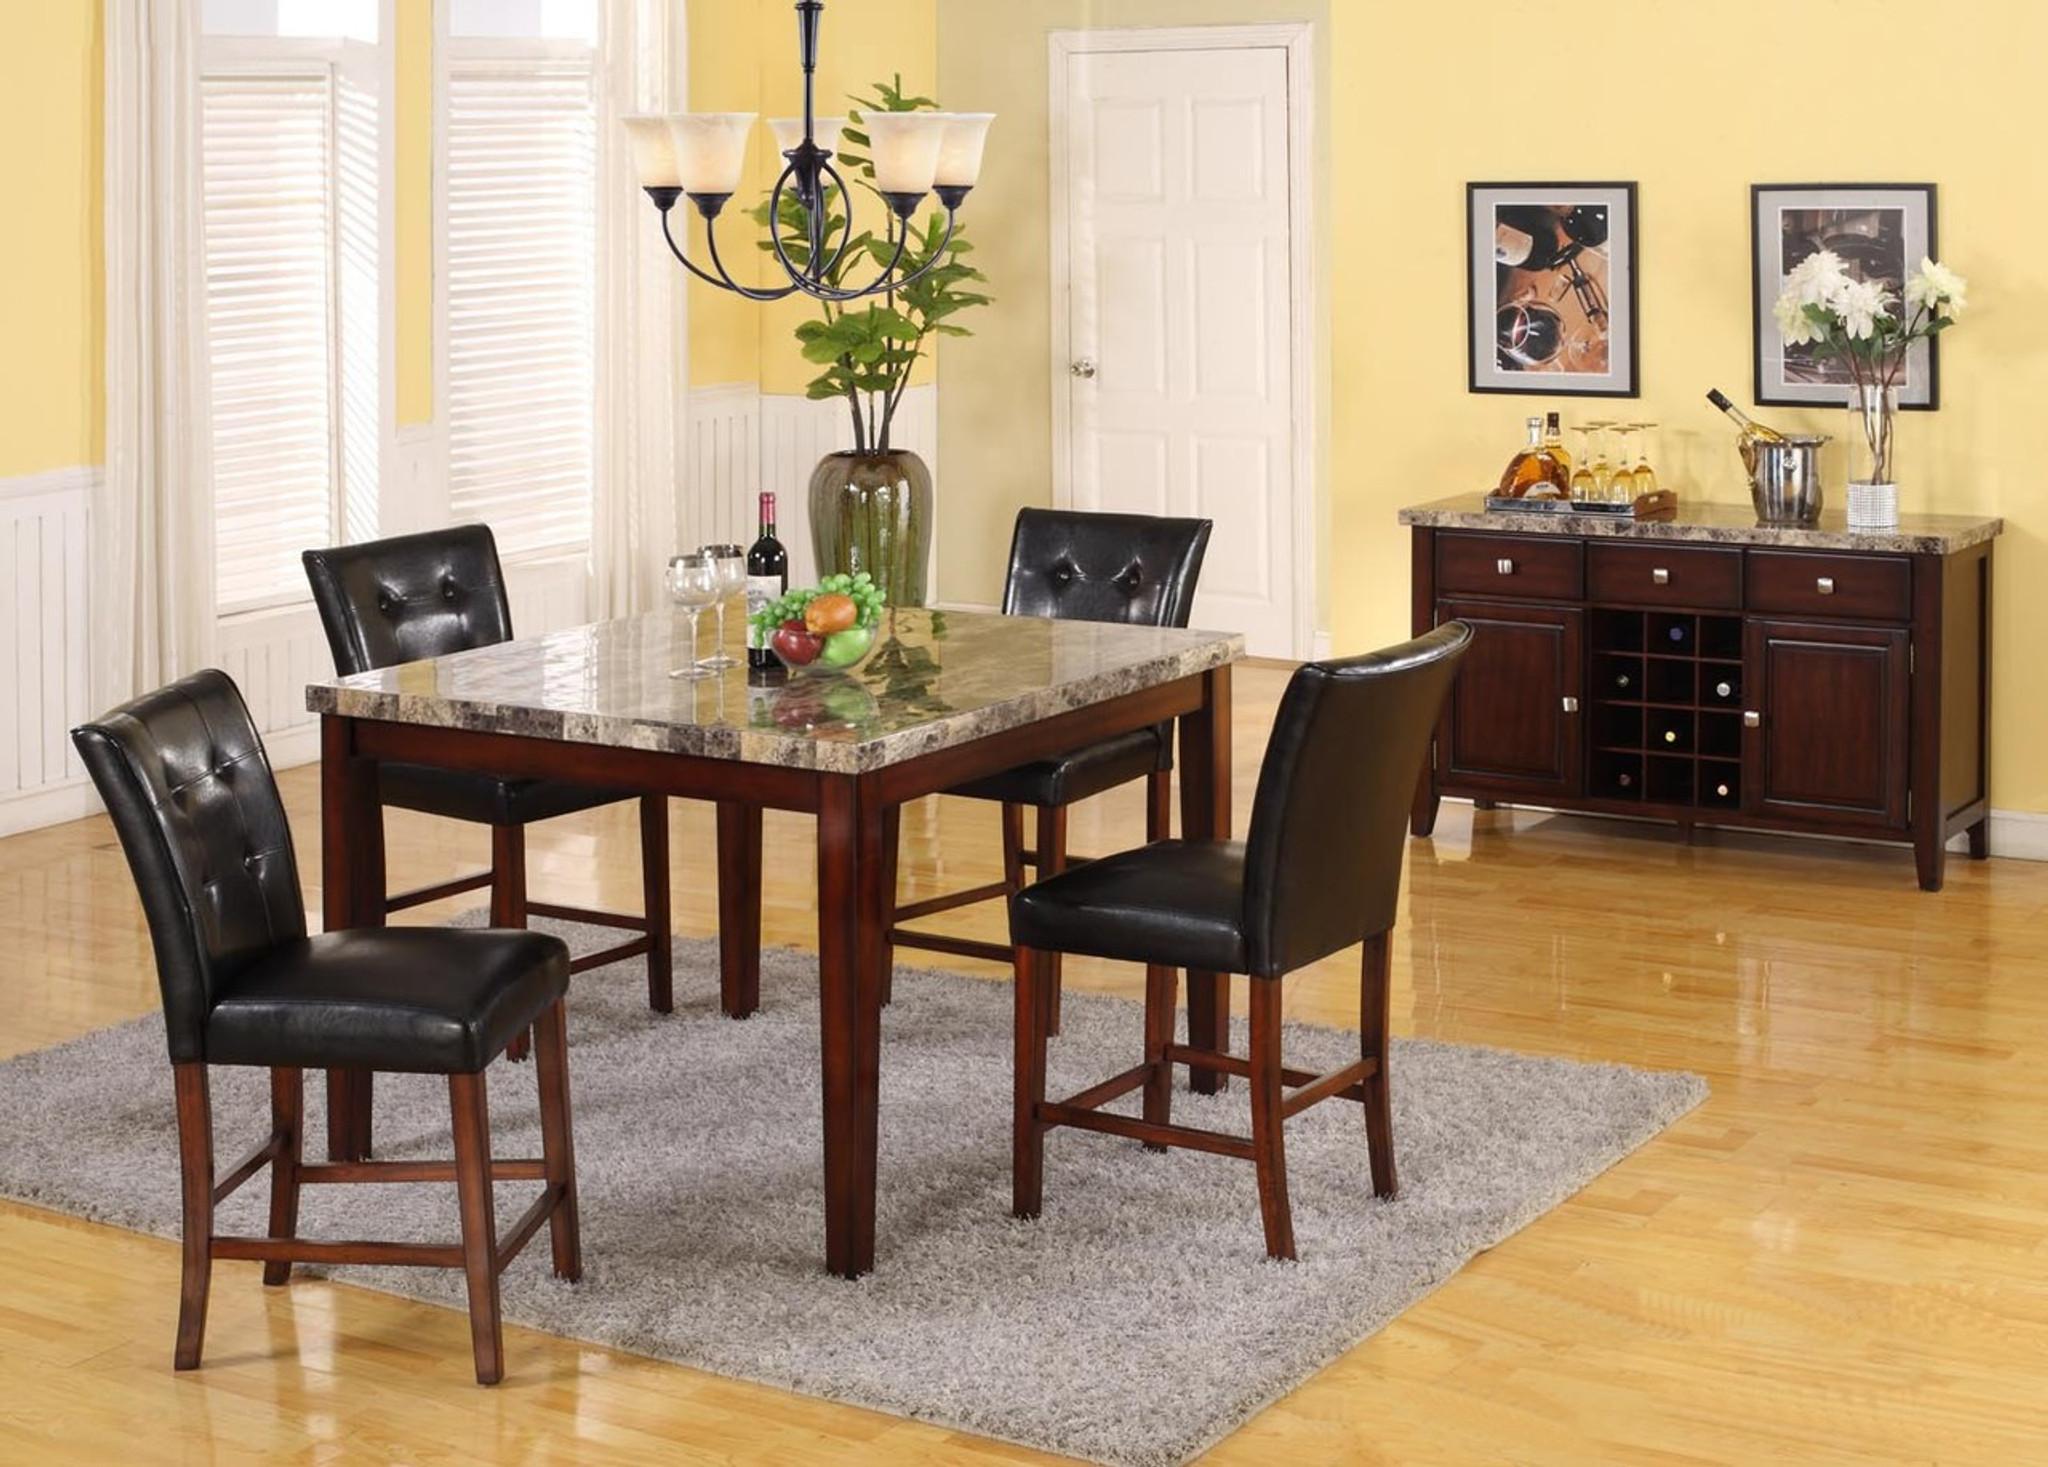 Tremendous Marco Counter Height Table Bar Stool 5 Pc Set Beatyapartments Chair Design Images Beatyapartmentscom